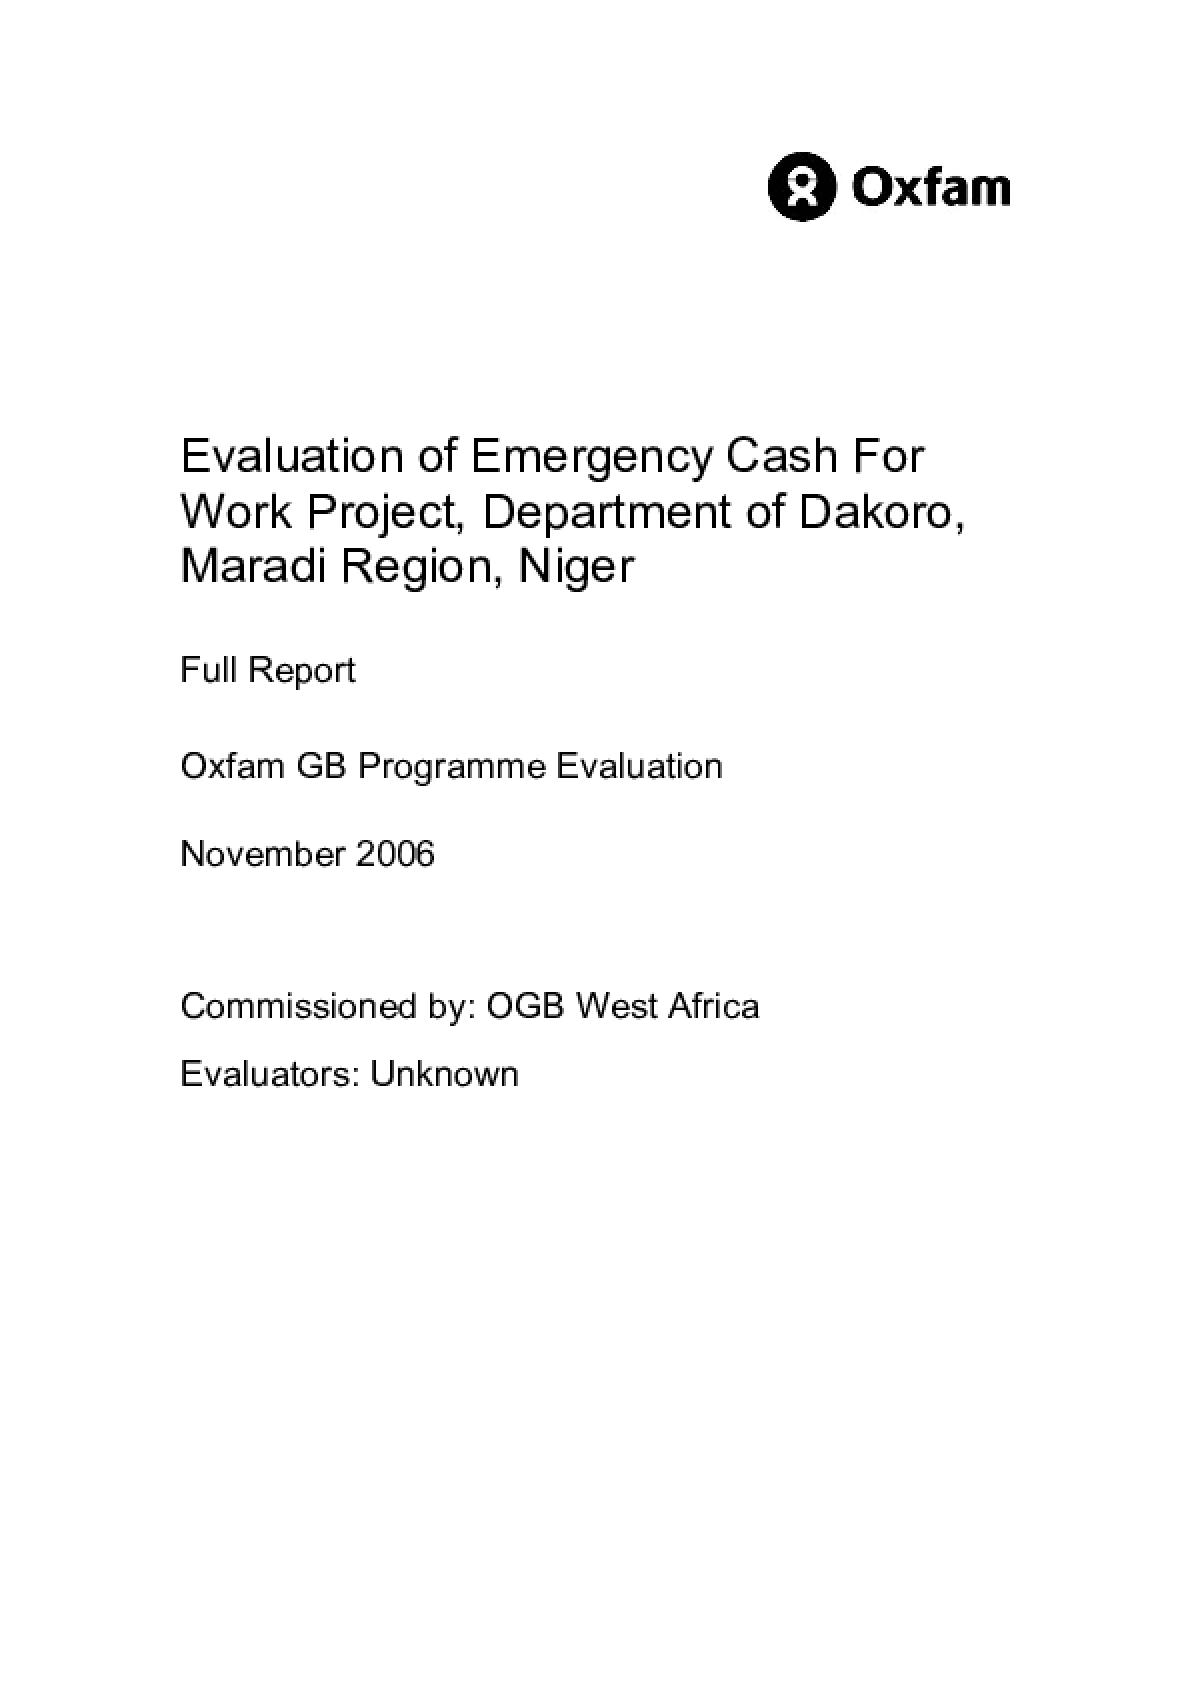 Evaluation of Emergency Cash For Work Project, Department of Dakoro, Maradi Region, Niger